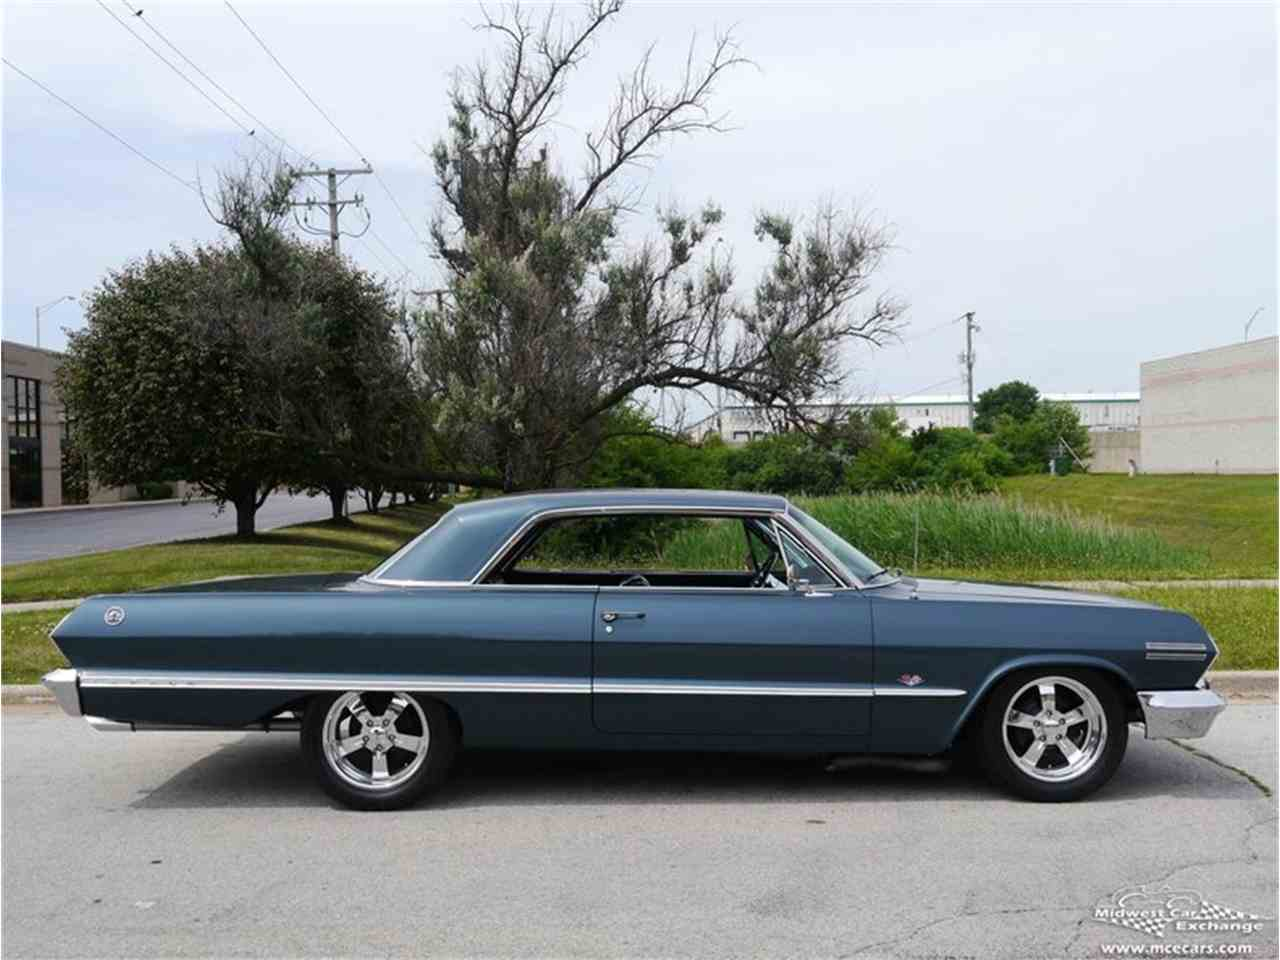 1964 impala wiper motor wiring diagram 1964 impala front